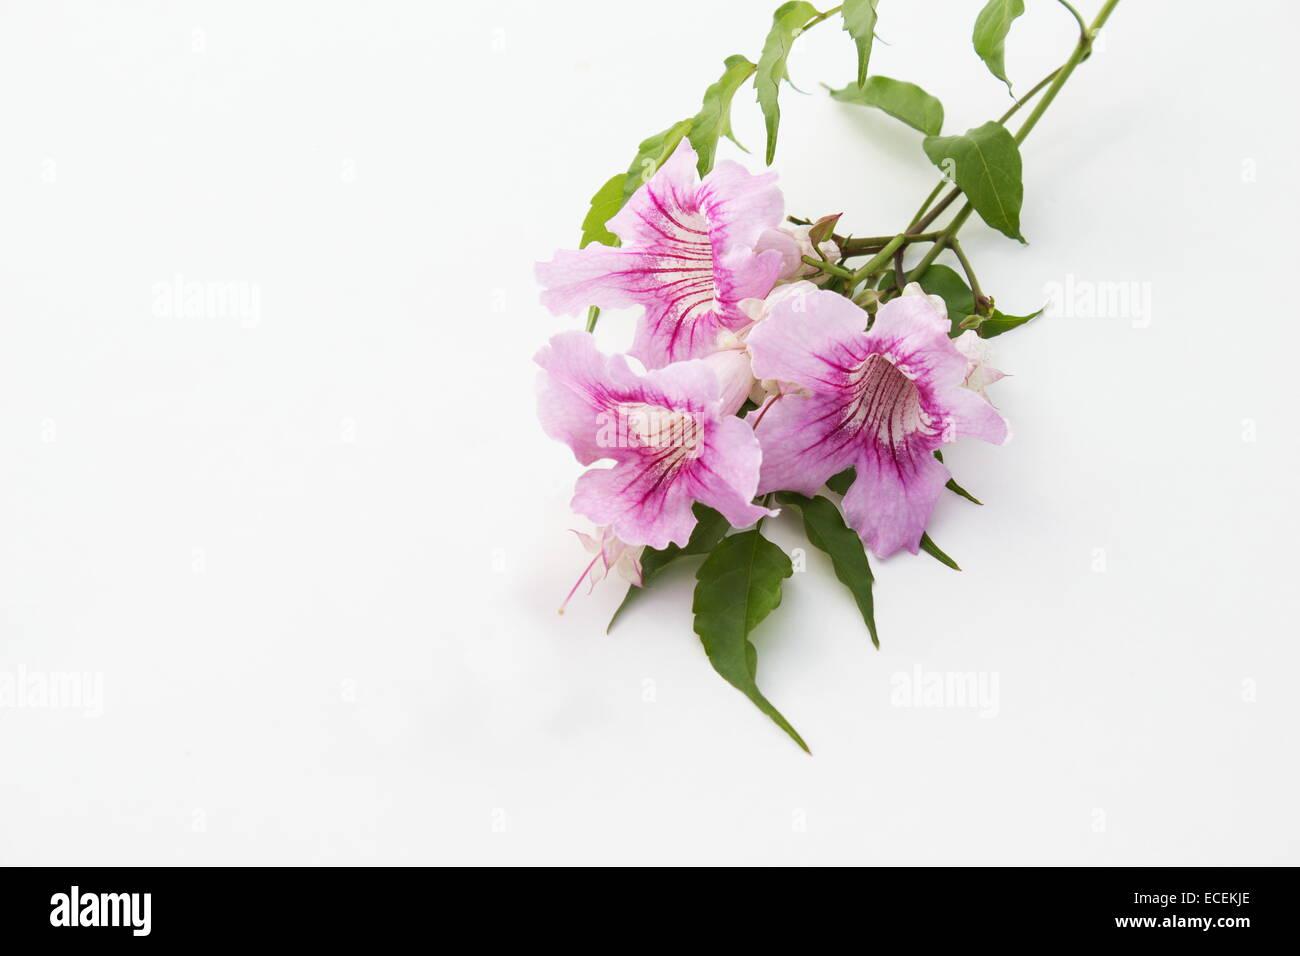 Pink Trumpet Vine Flowers Podranea Ricasoliana On White Background